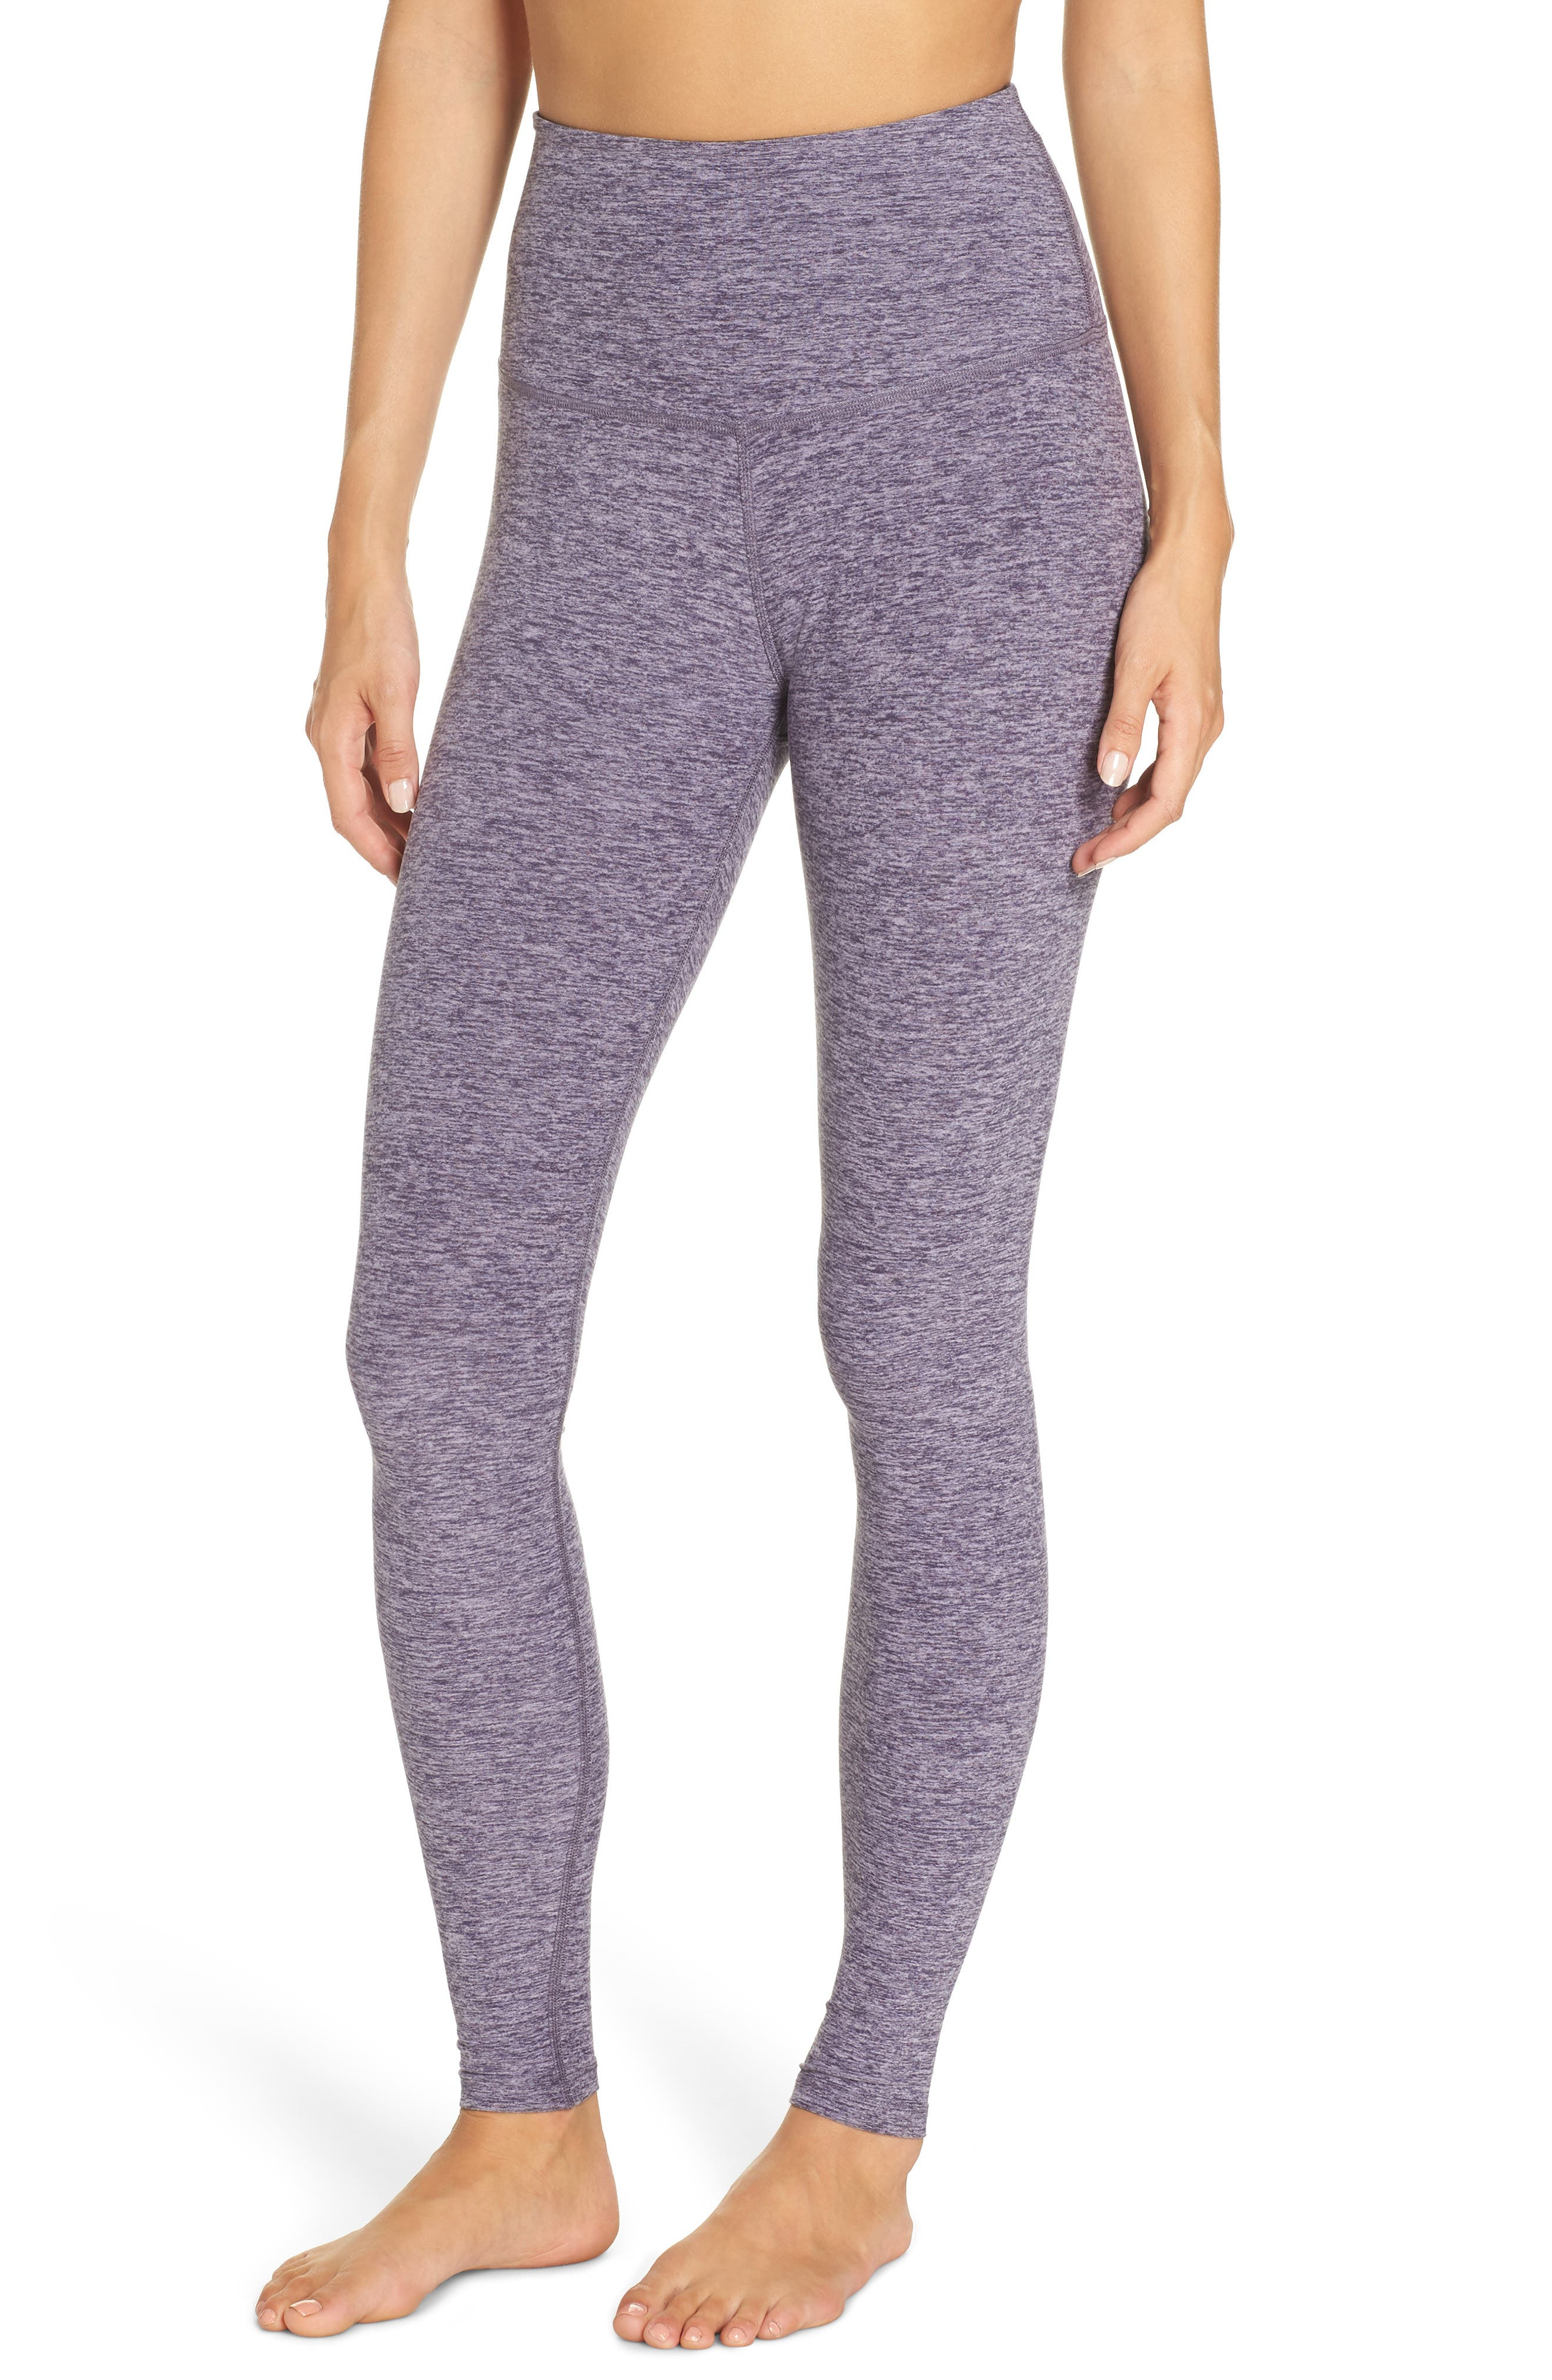 Womens Yoga Pants Nordstrom